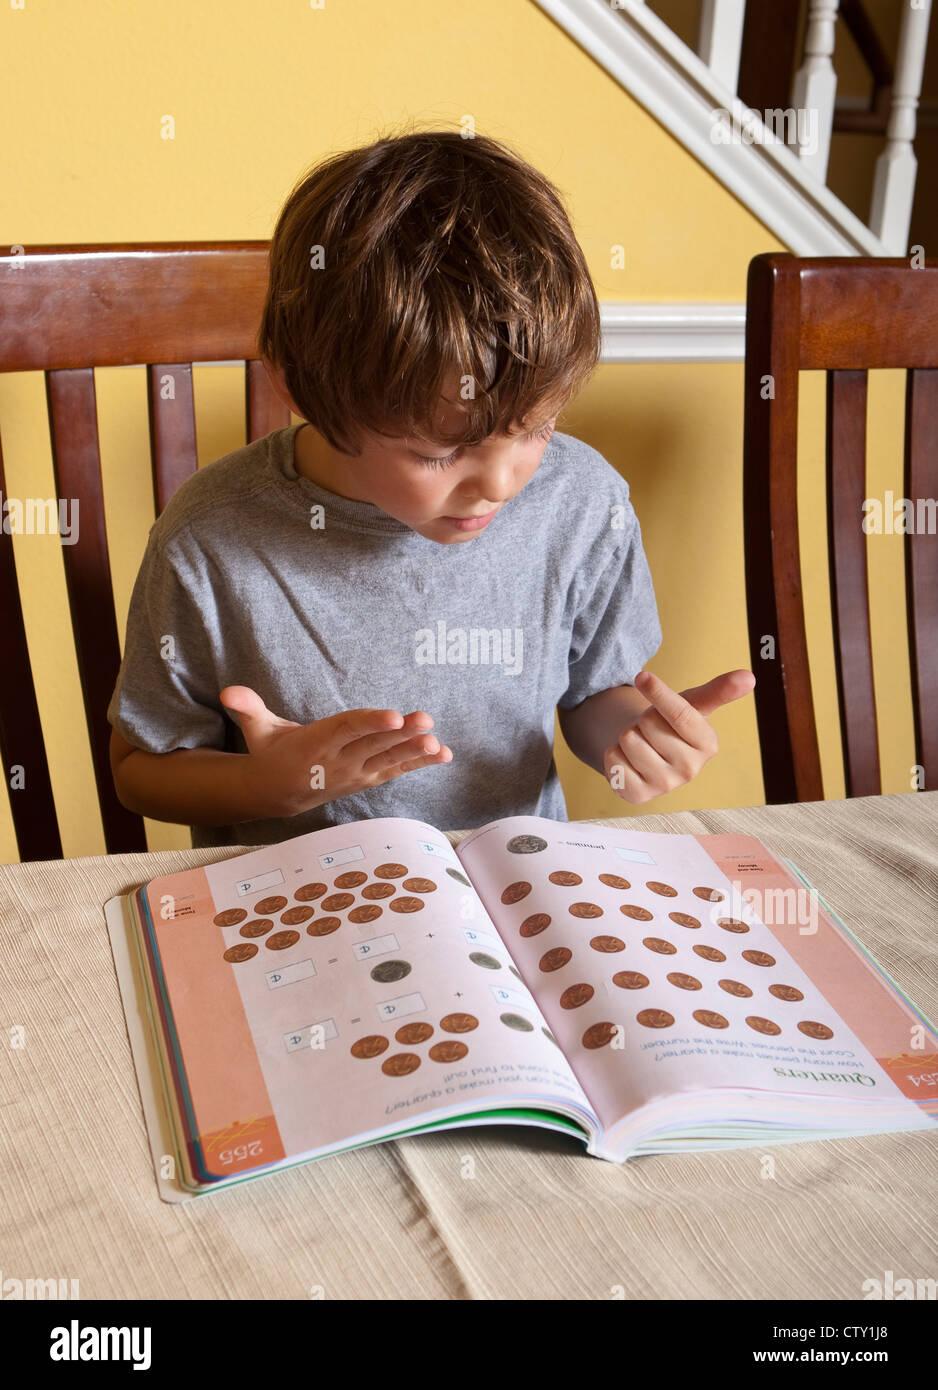 Does homework help in elementary school